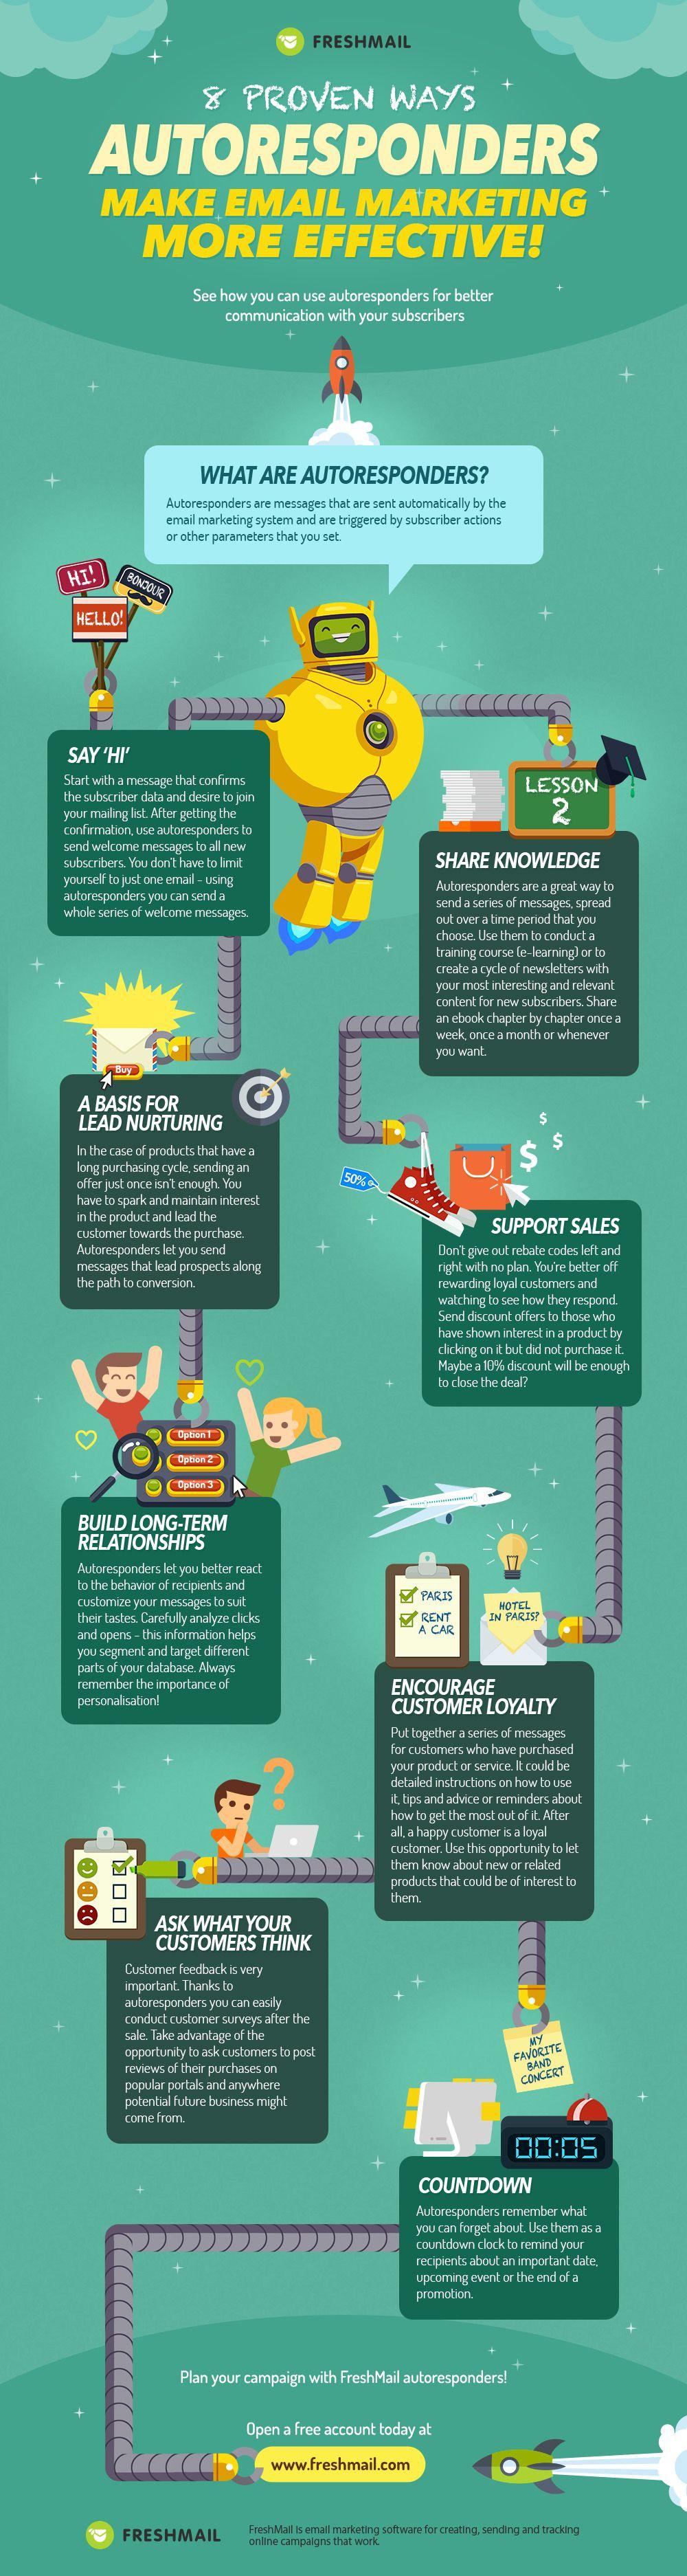 autoresponder infographic - compelling content marketing